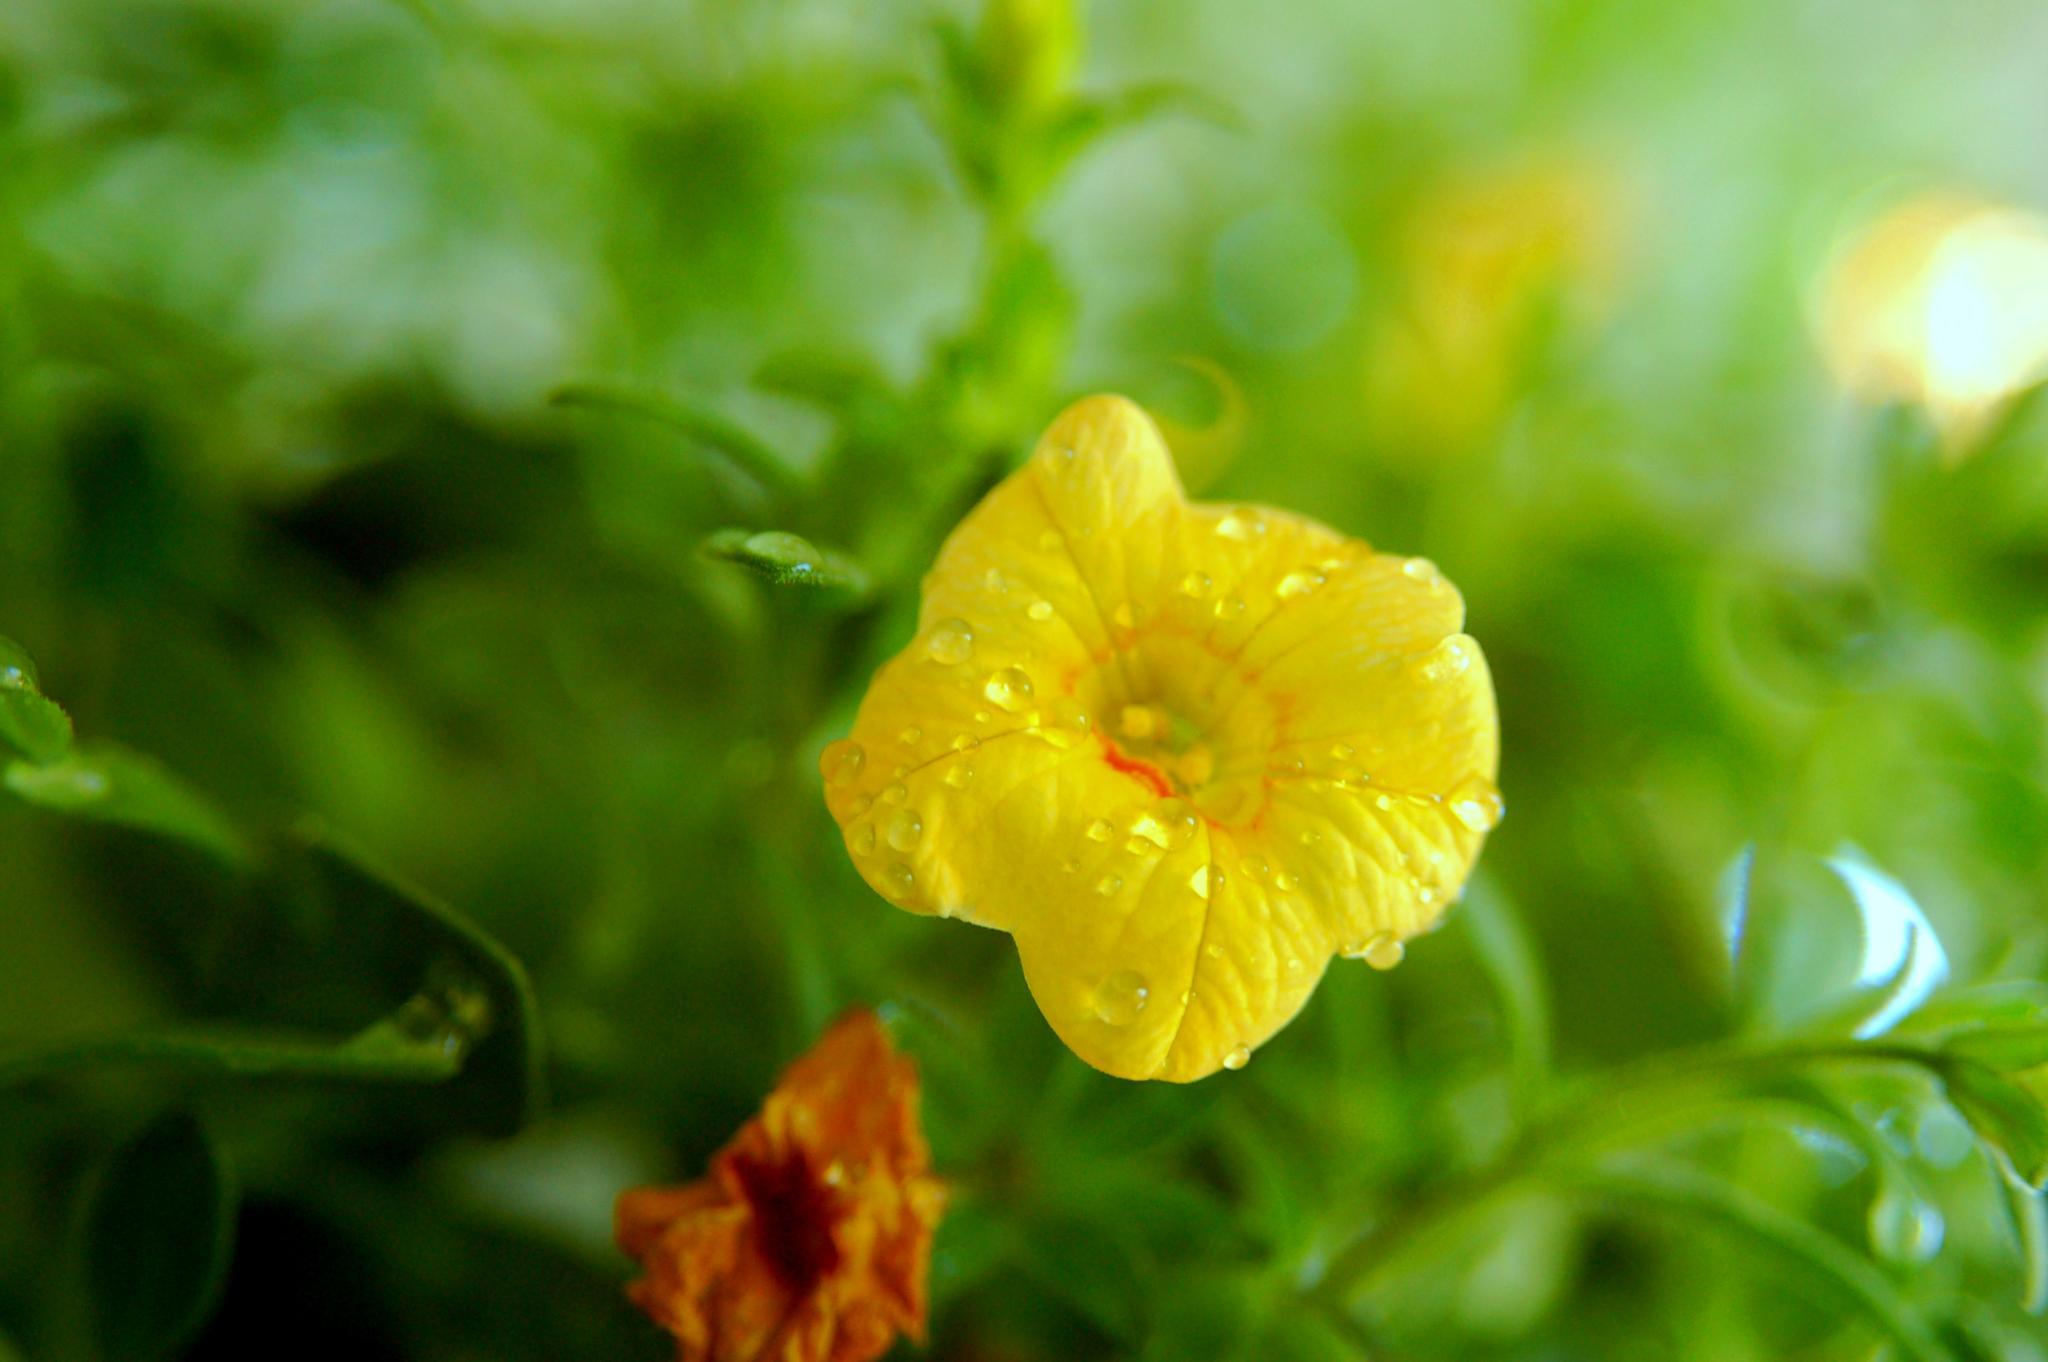 yellow wild flower by pgavin5000